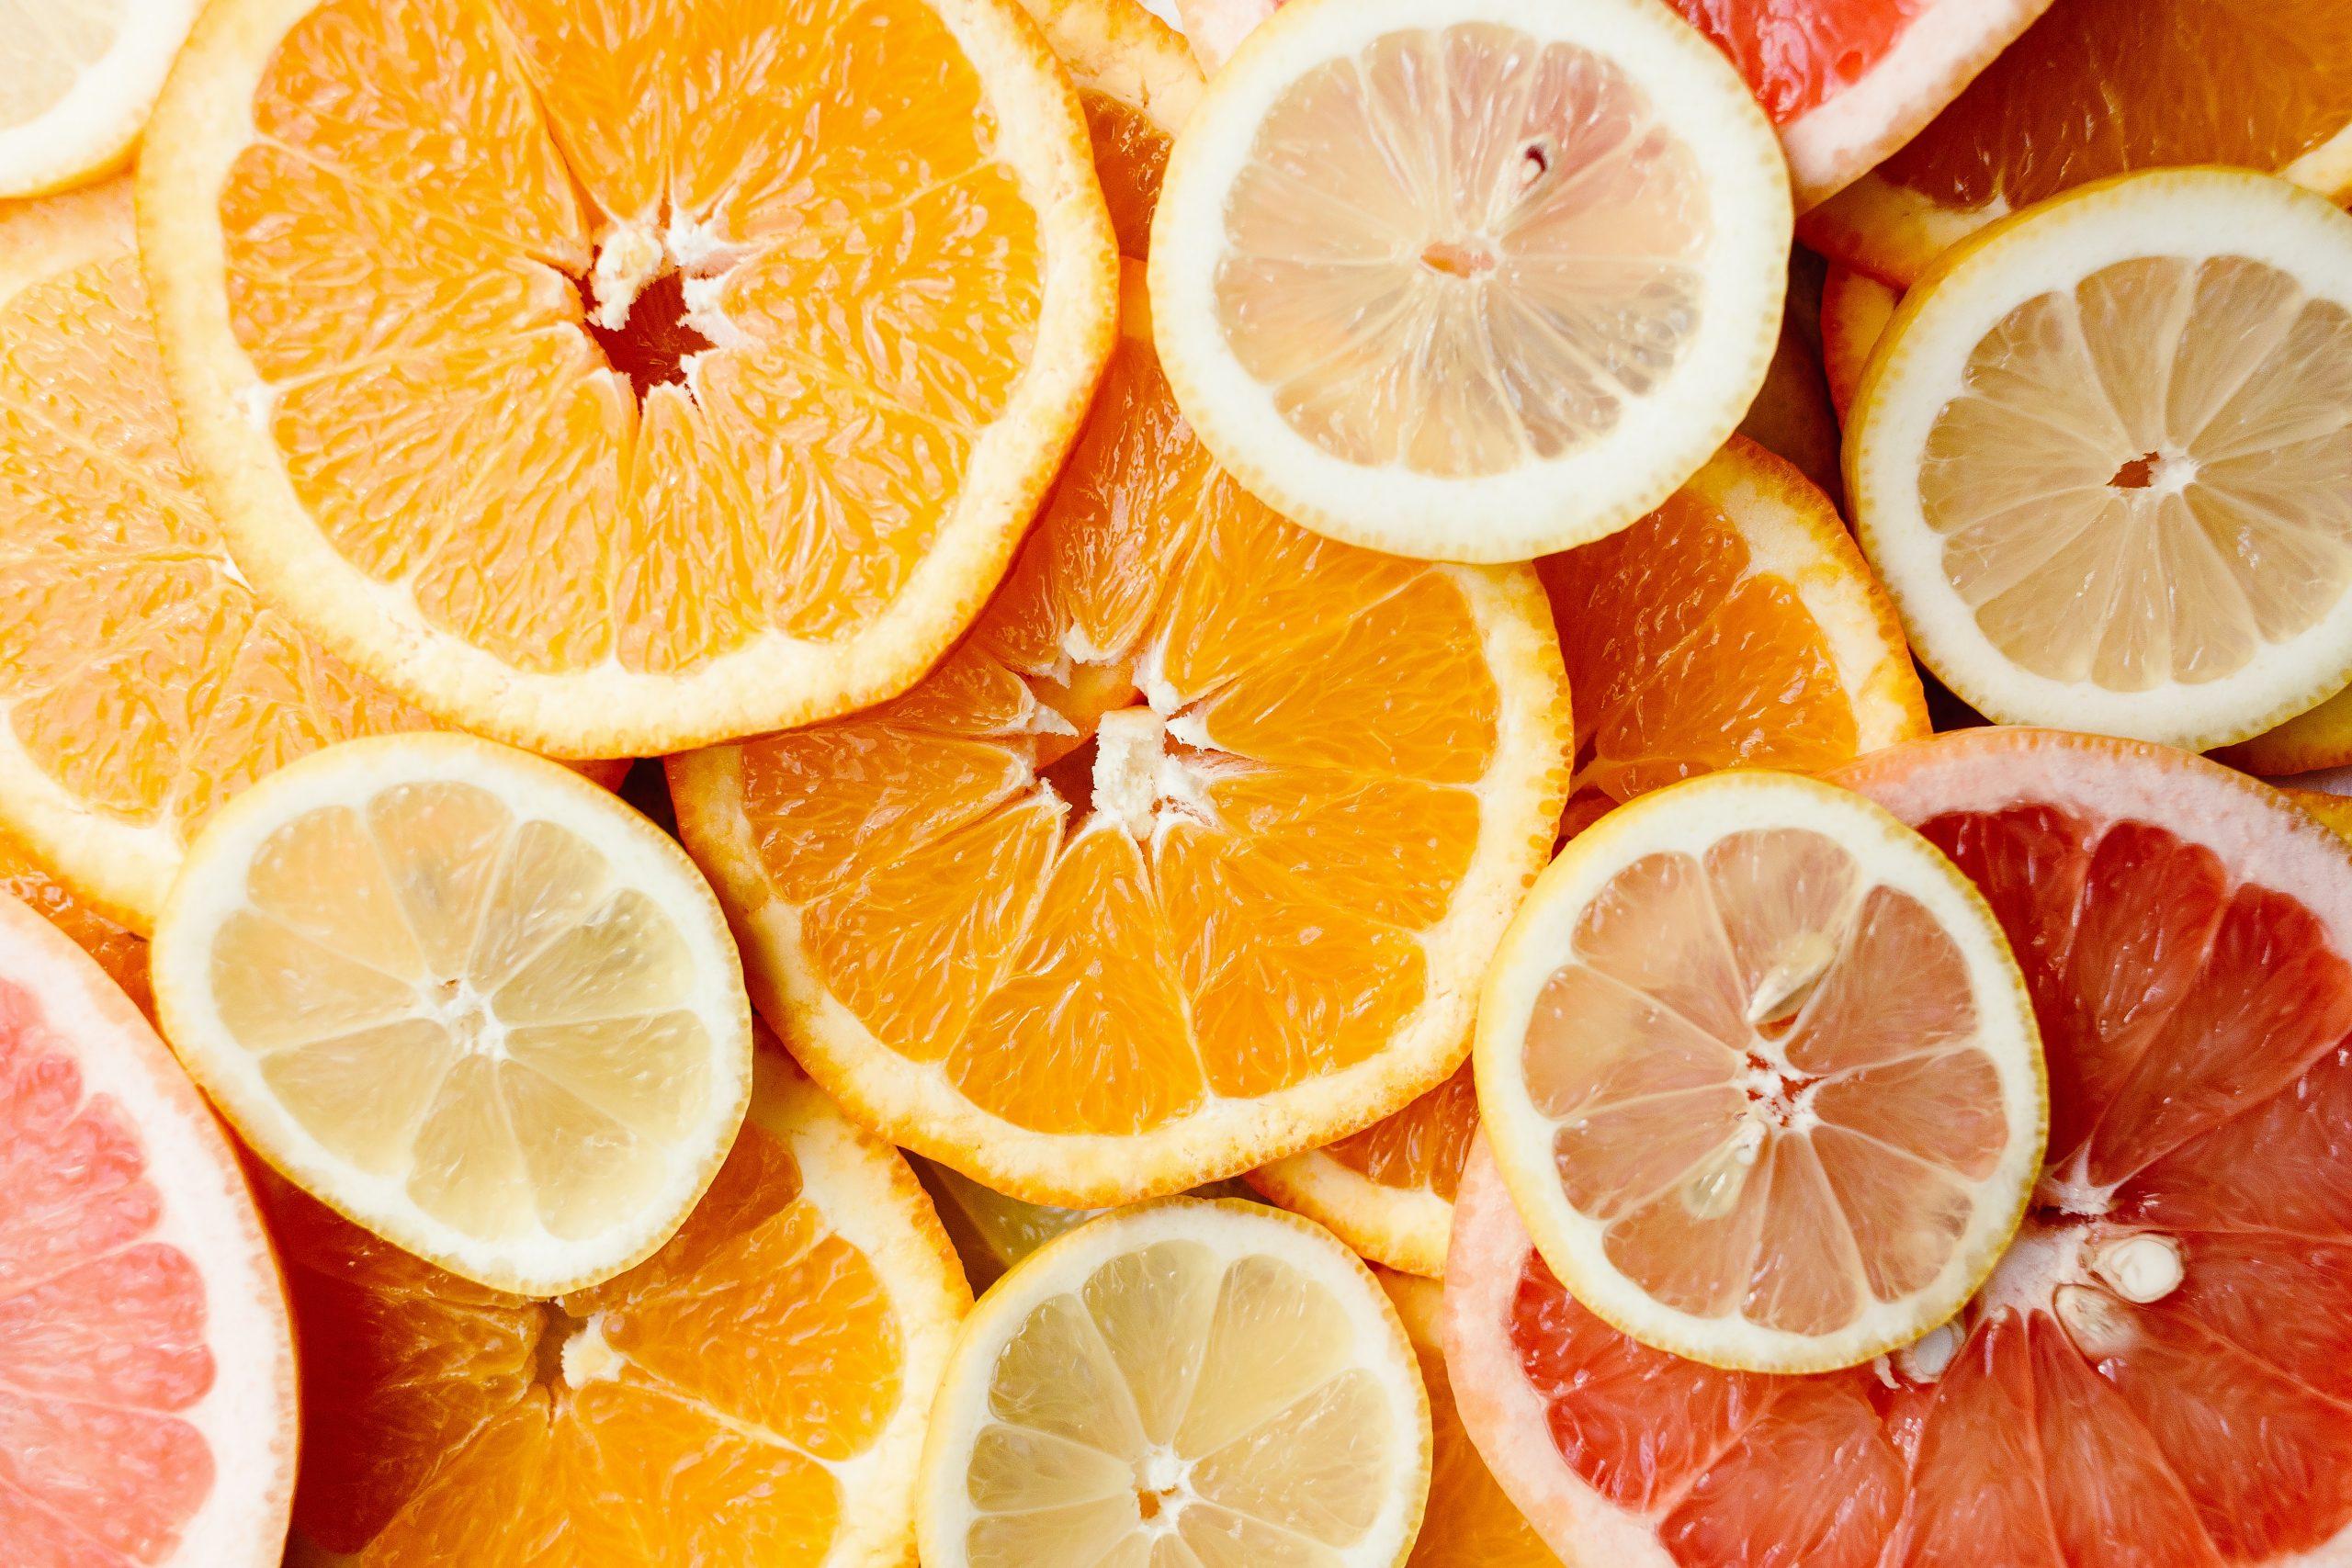 Vitamine C visage : Comment utiliser la vitamine C sur le visage ?